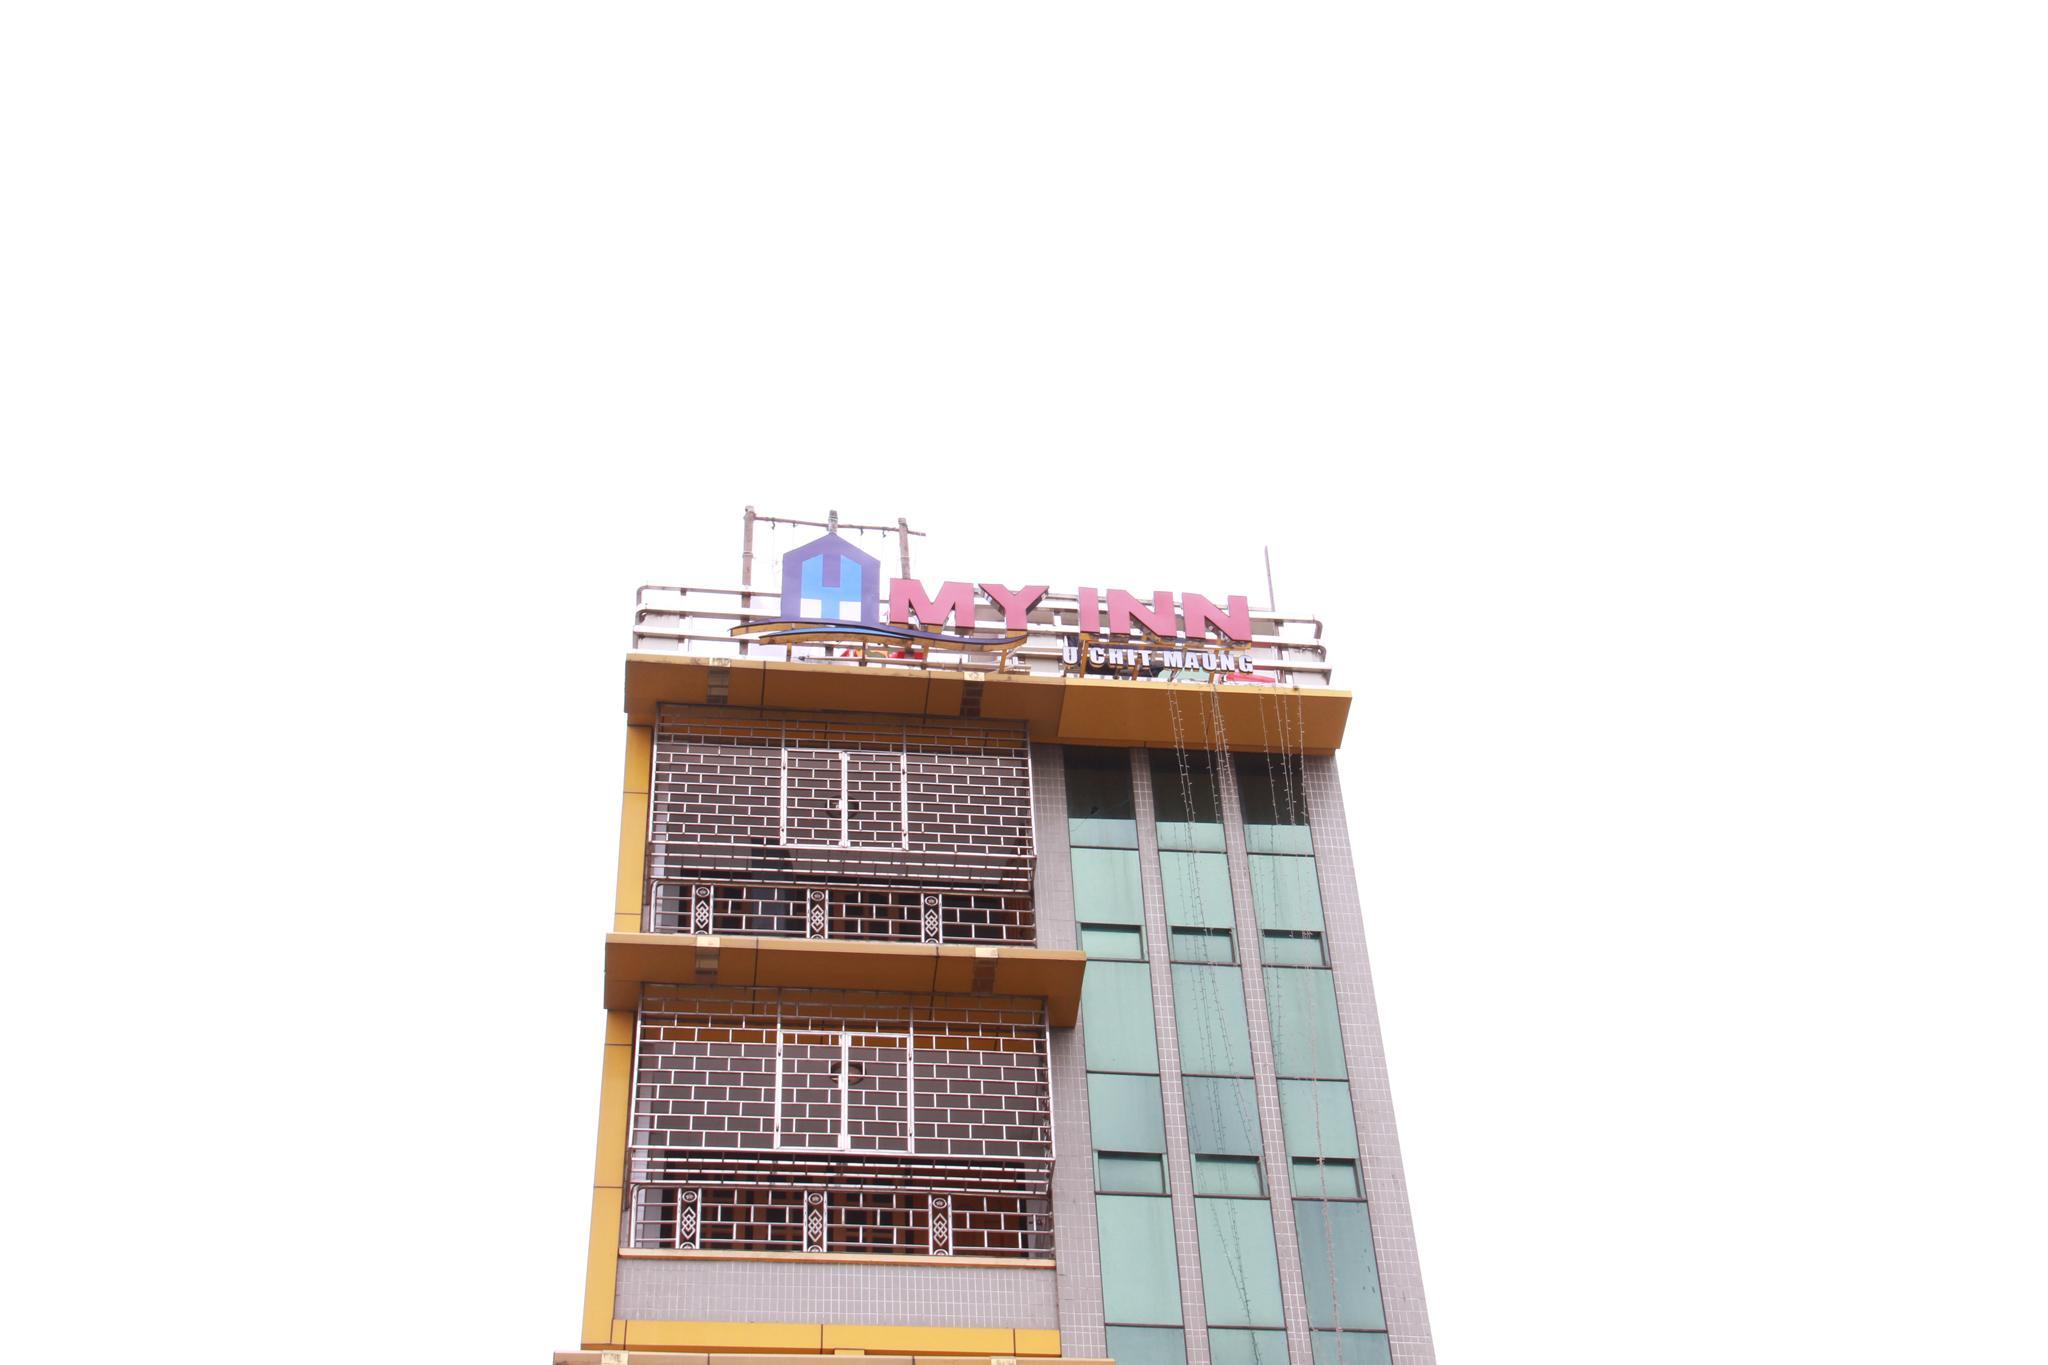 My Inn U Chit Maung In Myanmar